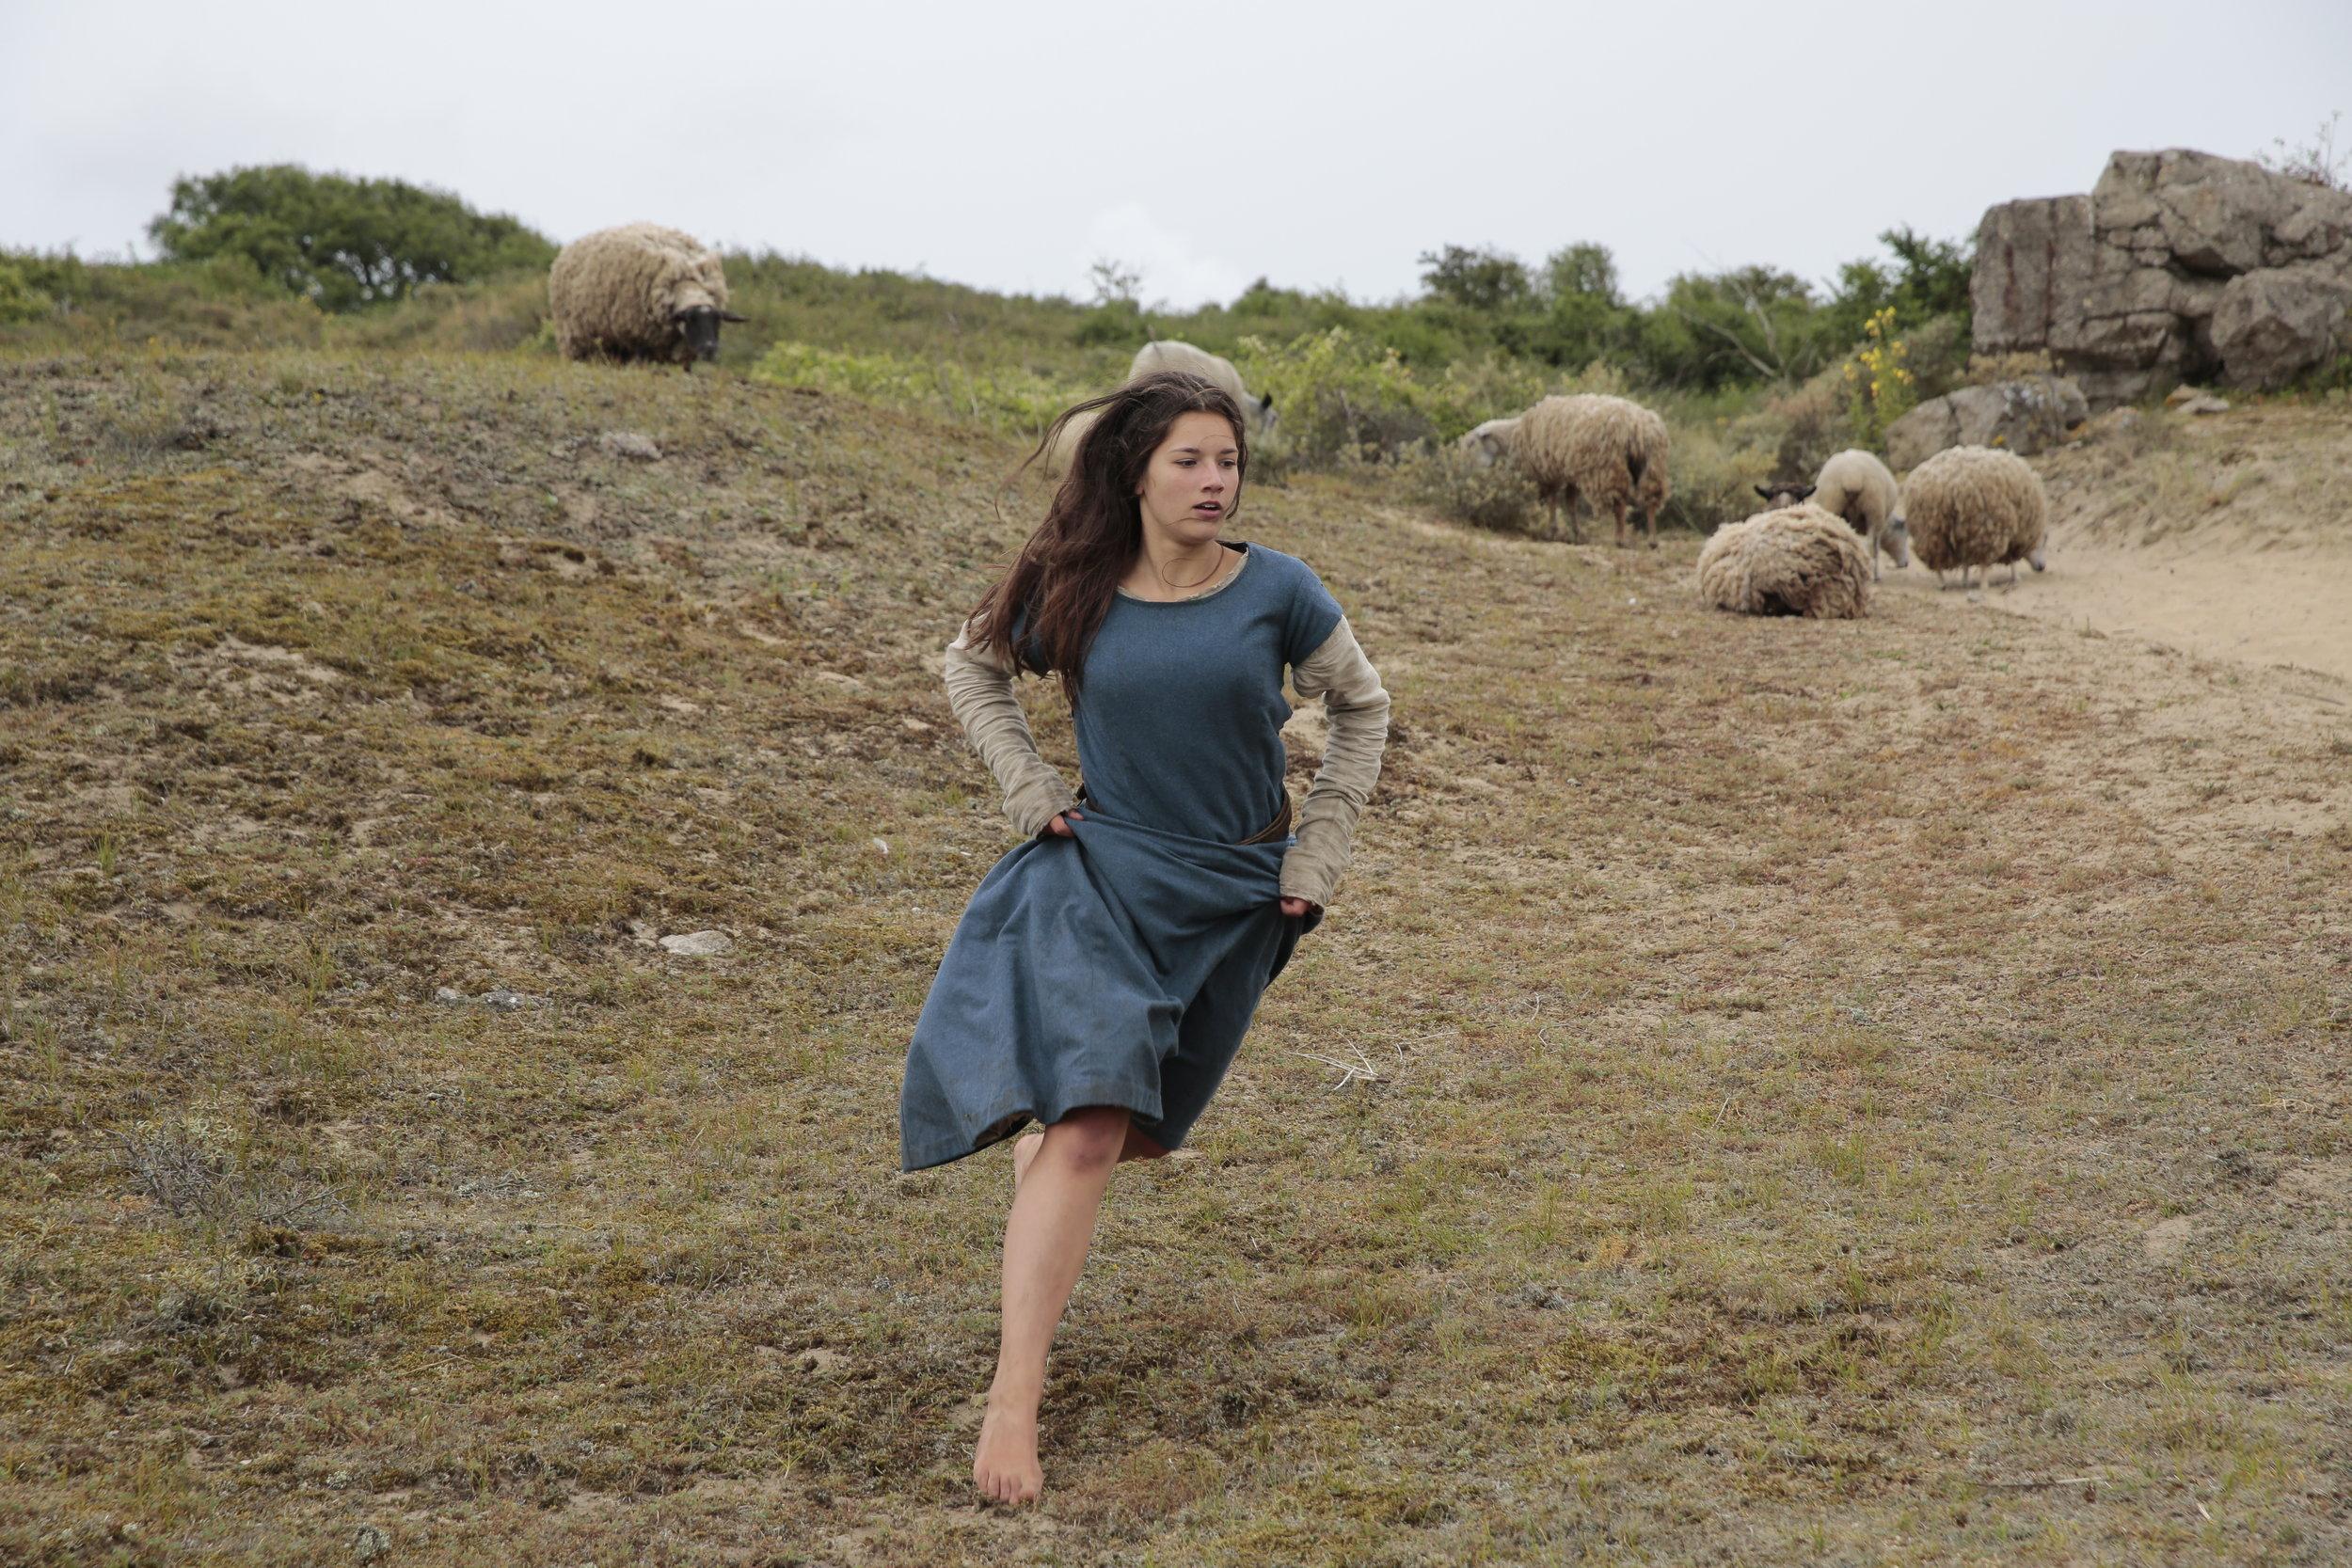 JEANNETTE, L'ENFANCE DE JEANNE D'ARC_Photographe.D.Koskas©TAOS Films - ARTE France_I7A5603.JPG